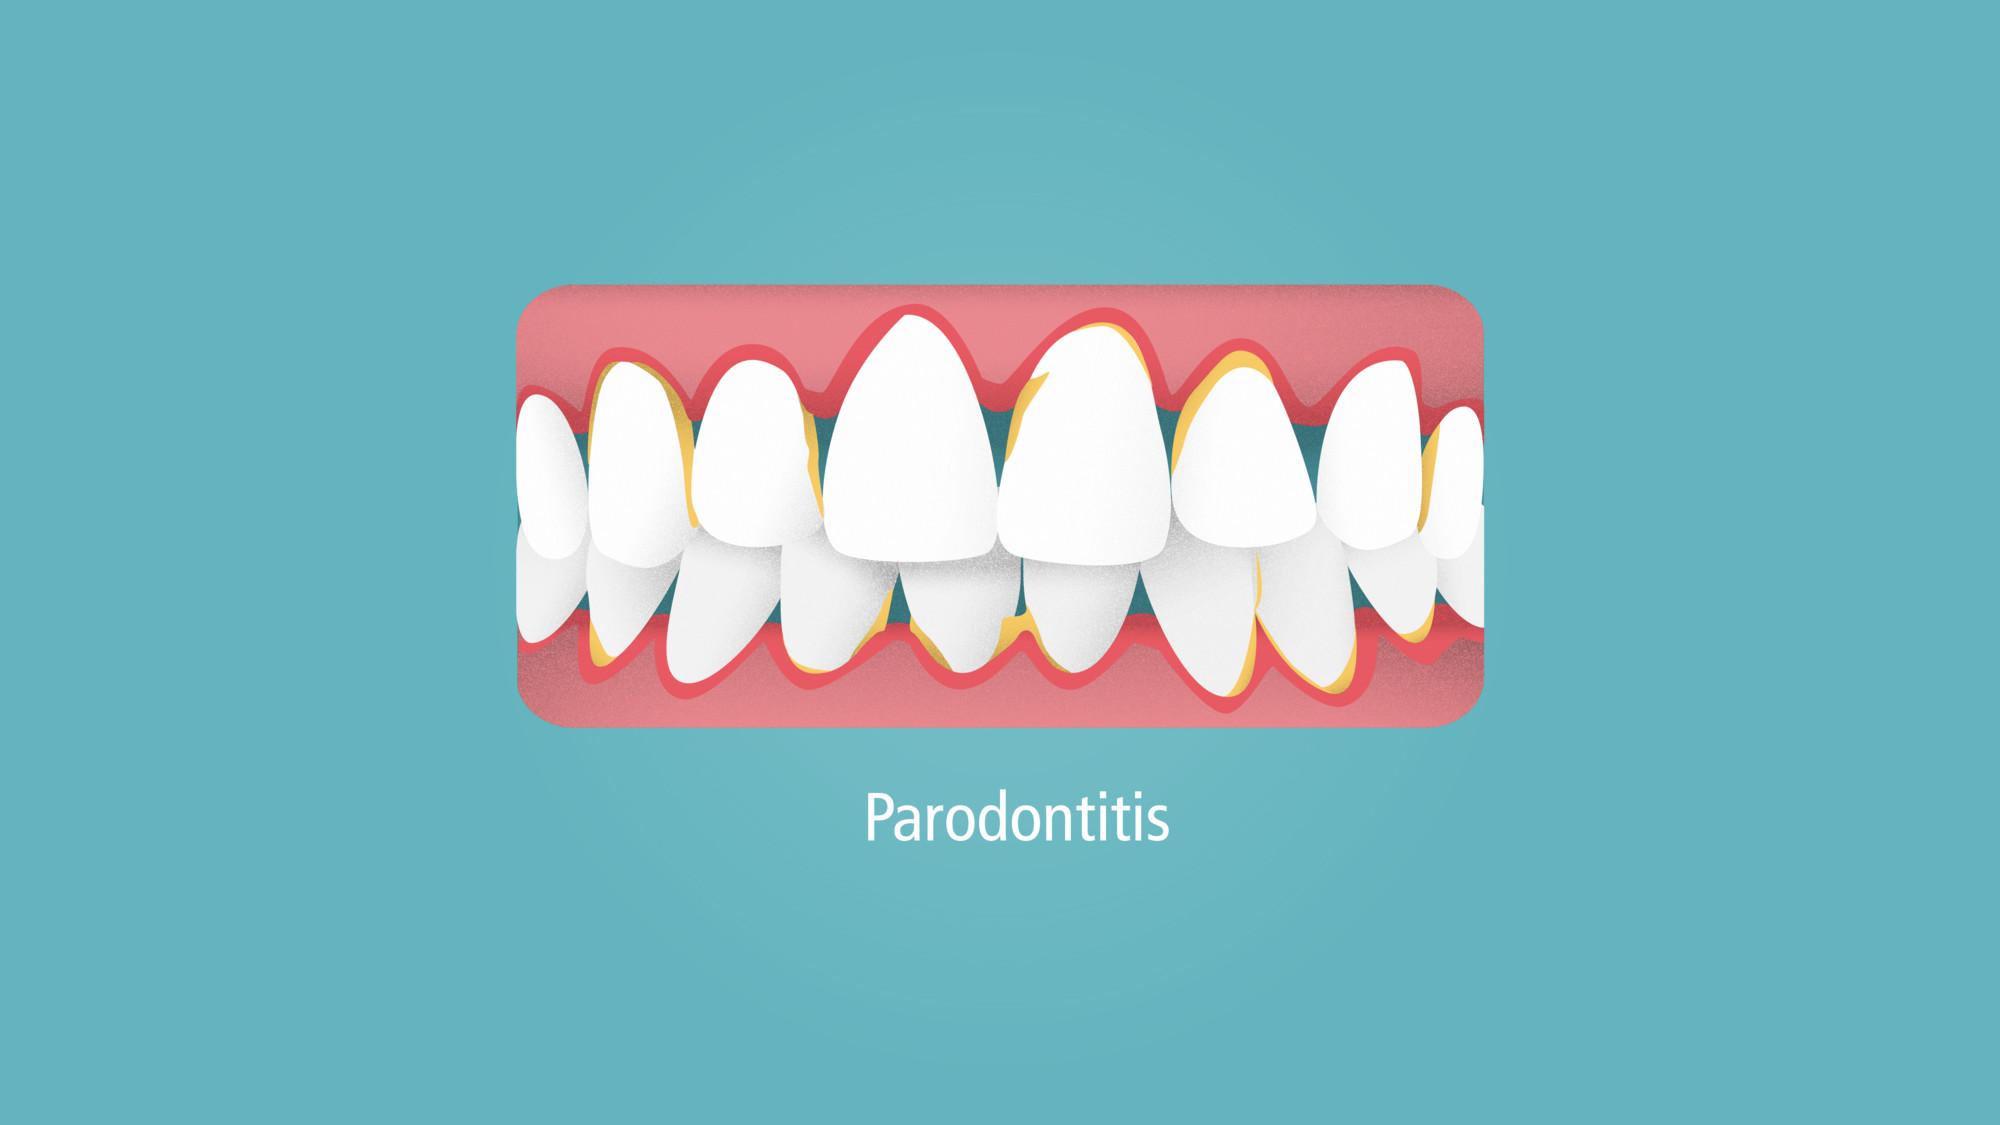 rs2856_parodontitis-003-lpr